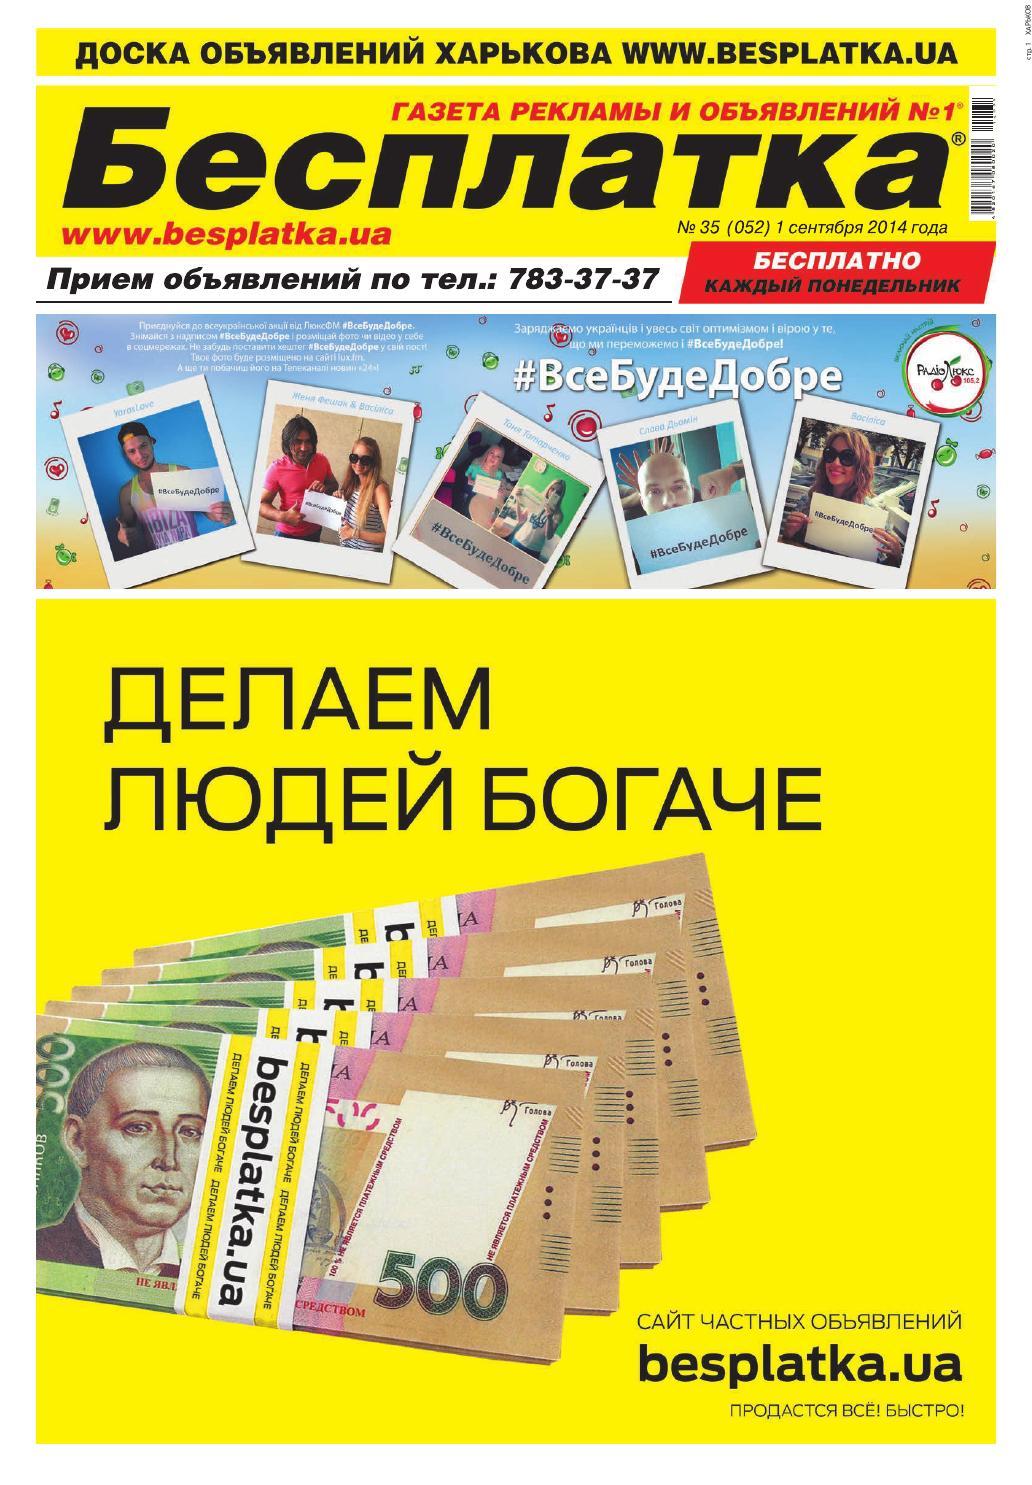 дбн журнал м19